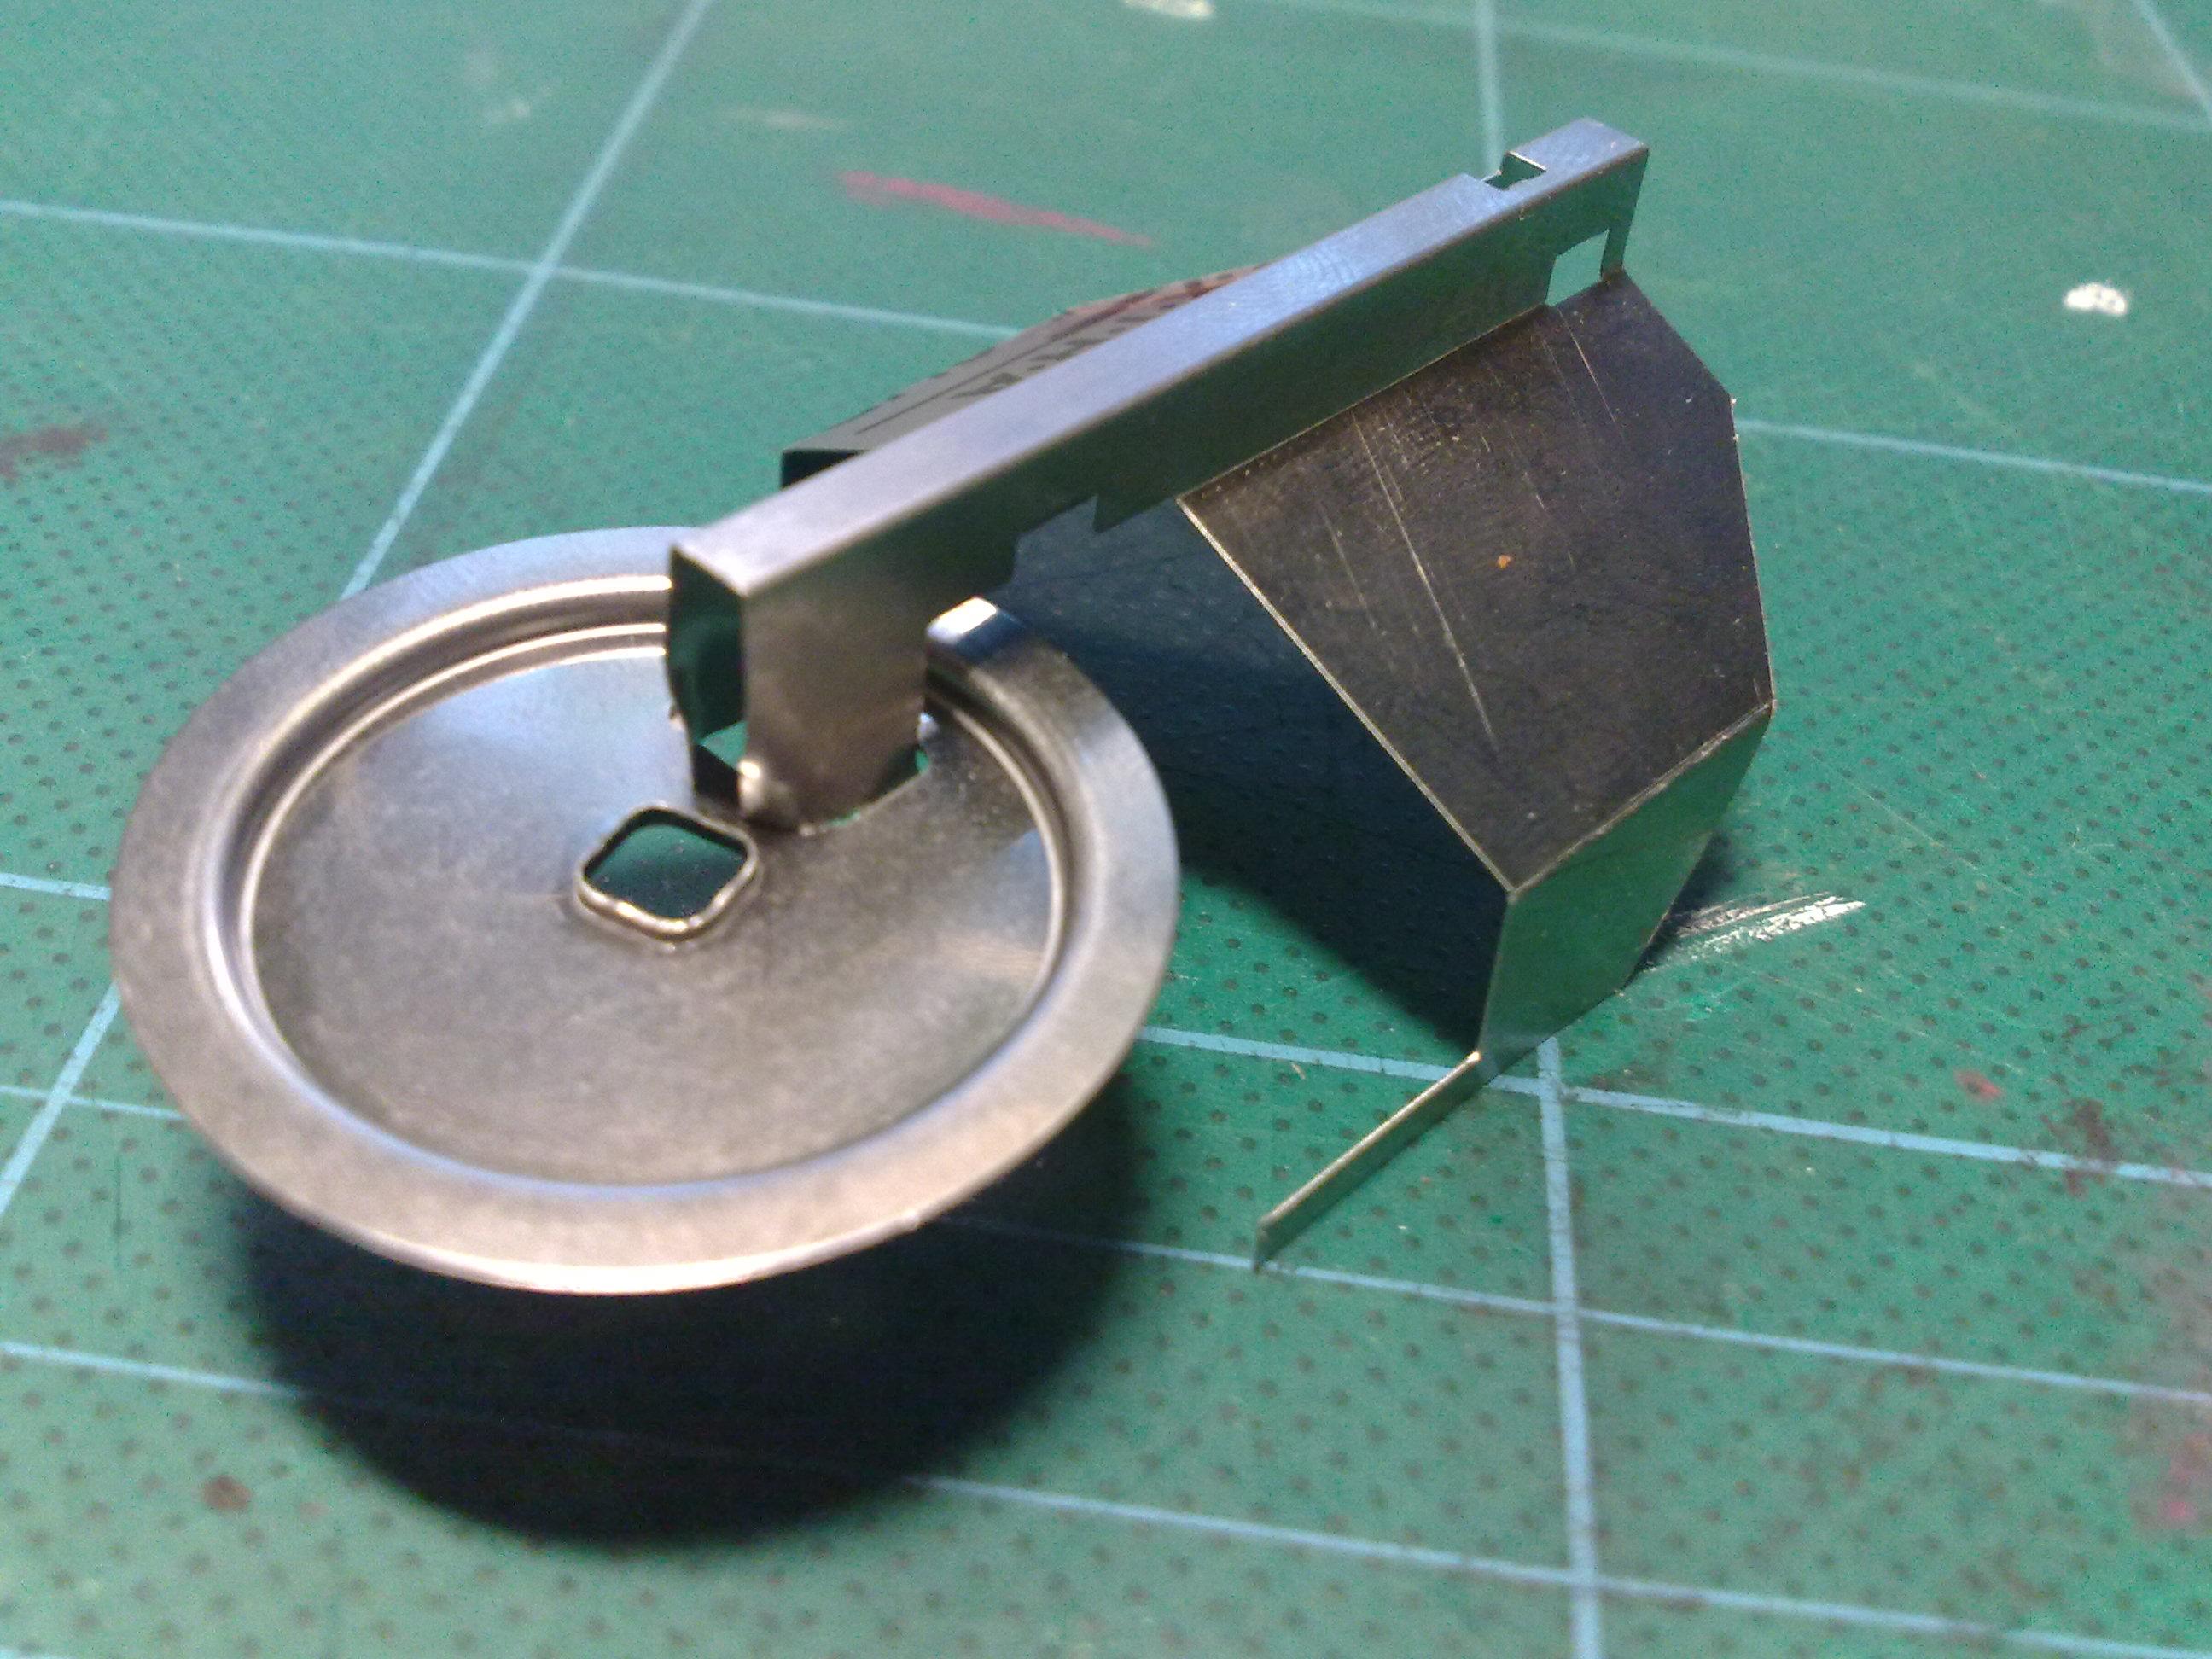 Klingon Bird of Prey made out of a Floppy disk